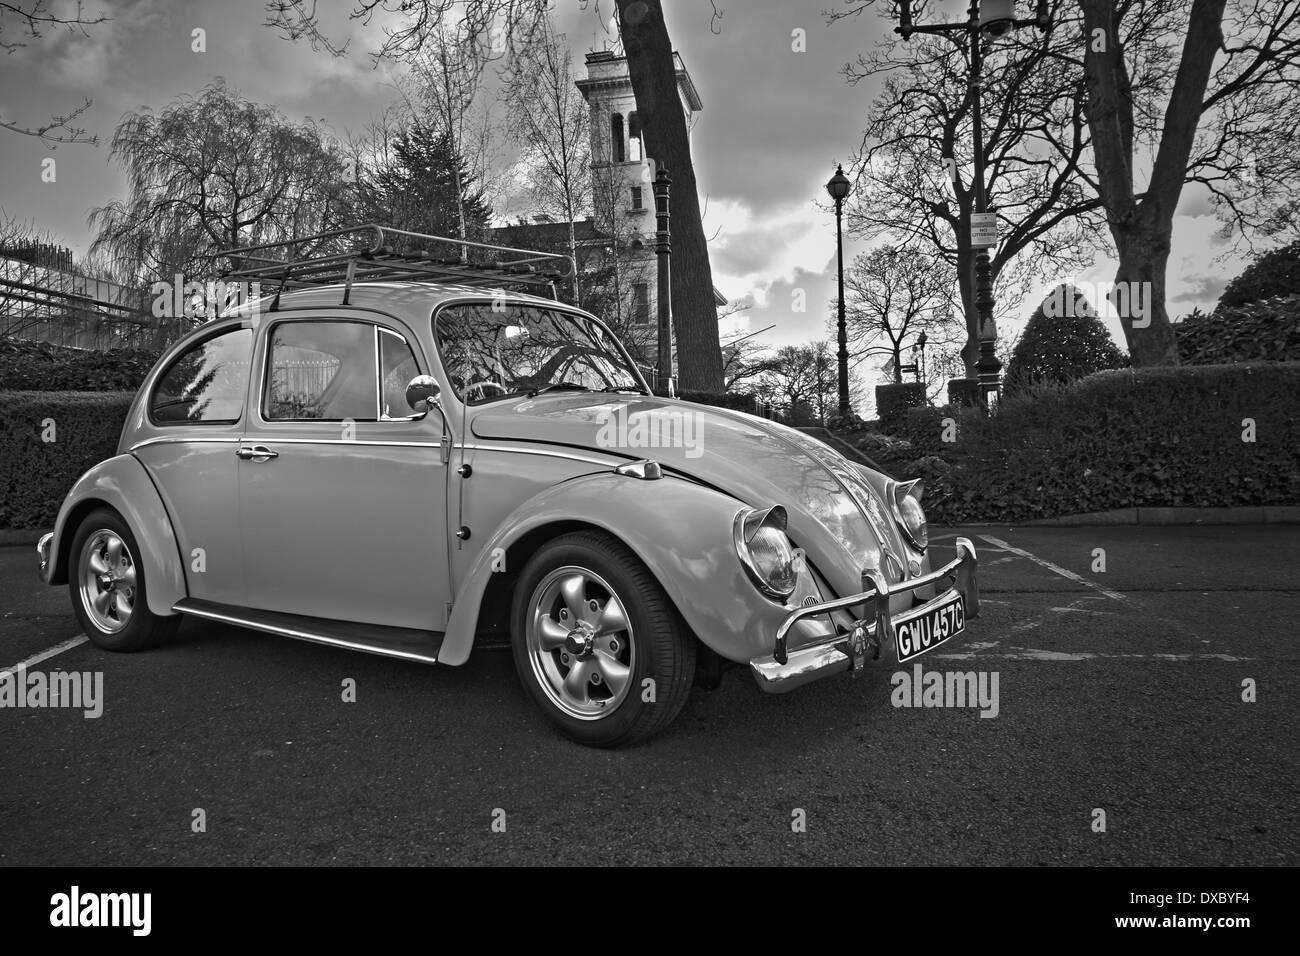 1965 Volkswagen Beetle HDR Mono - Stock Image